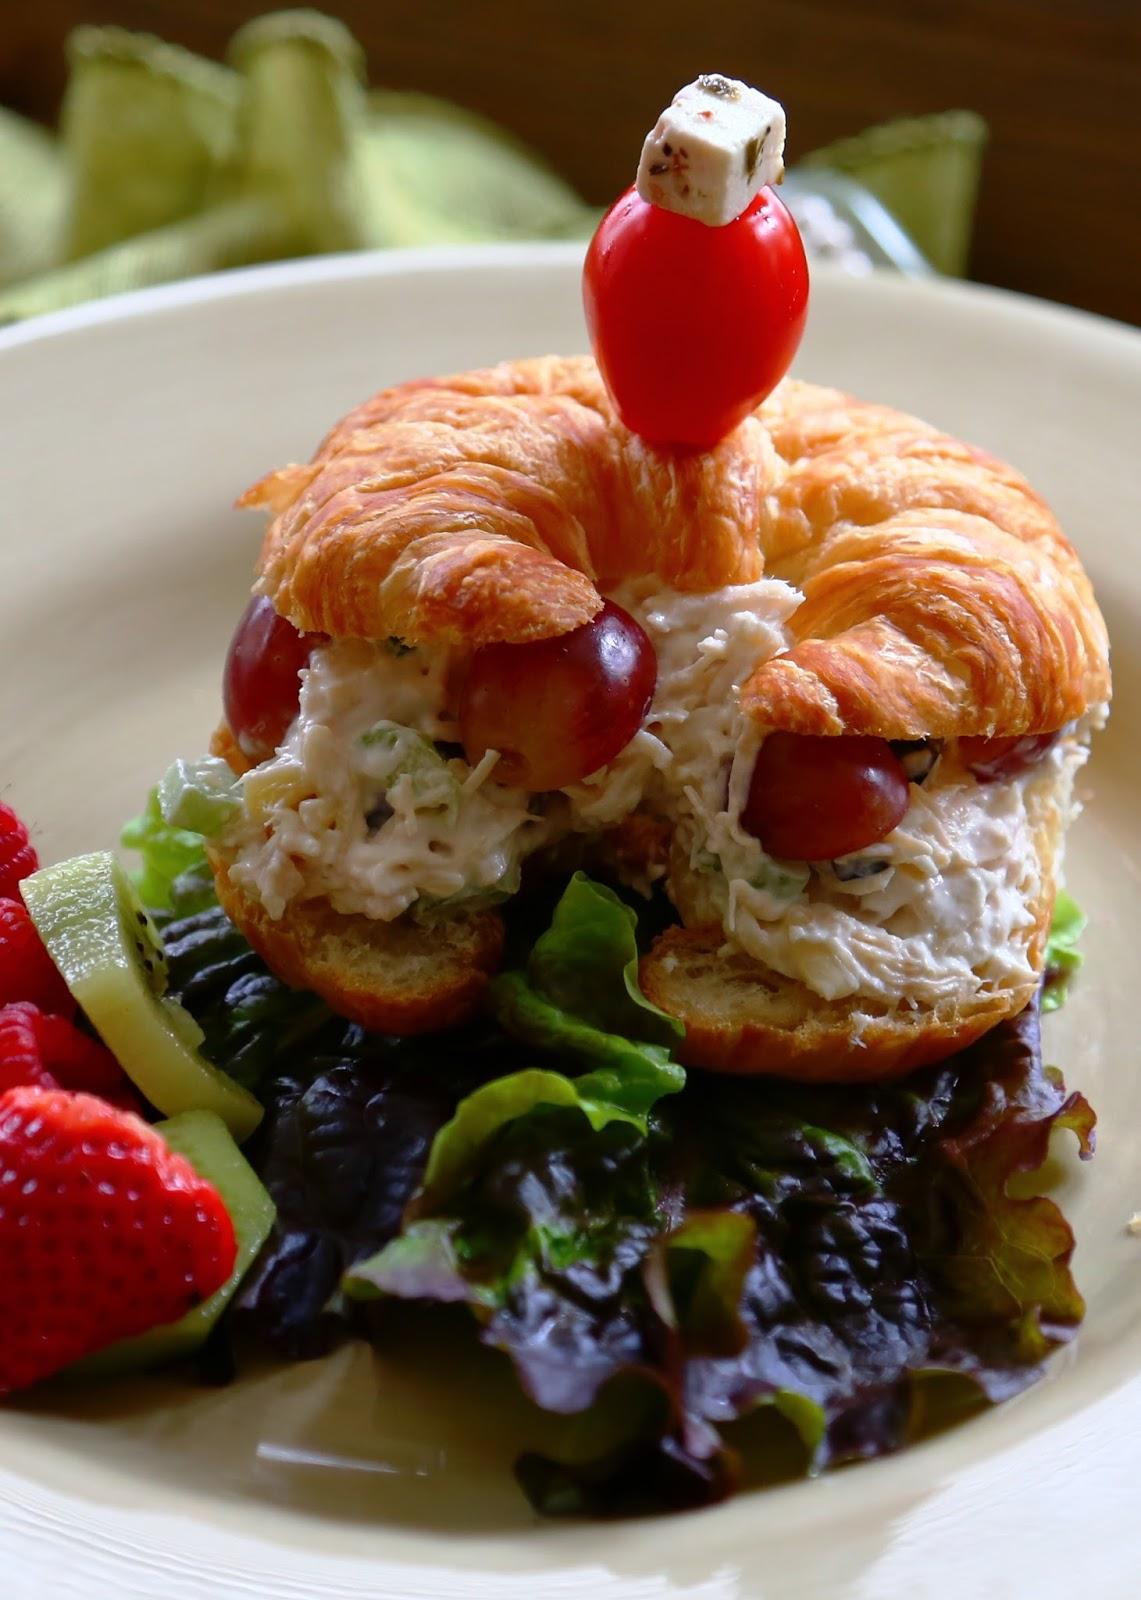 Decorated Mantel Chicken Salad Croissant Sandwiches